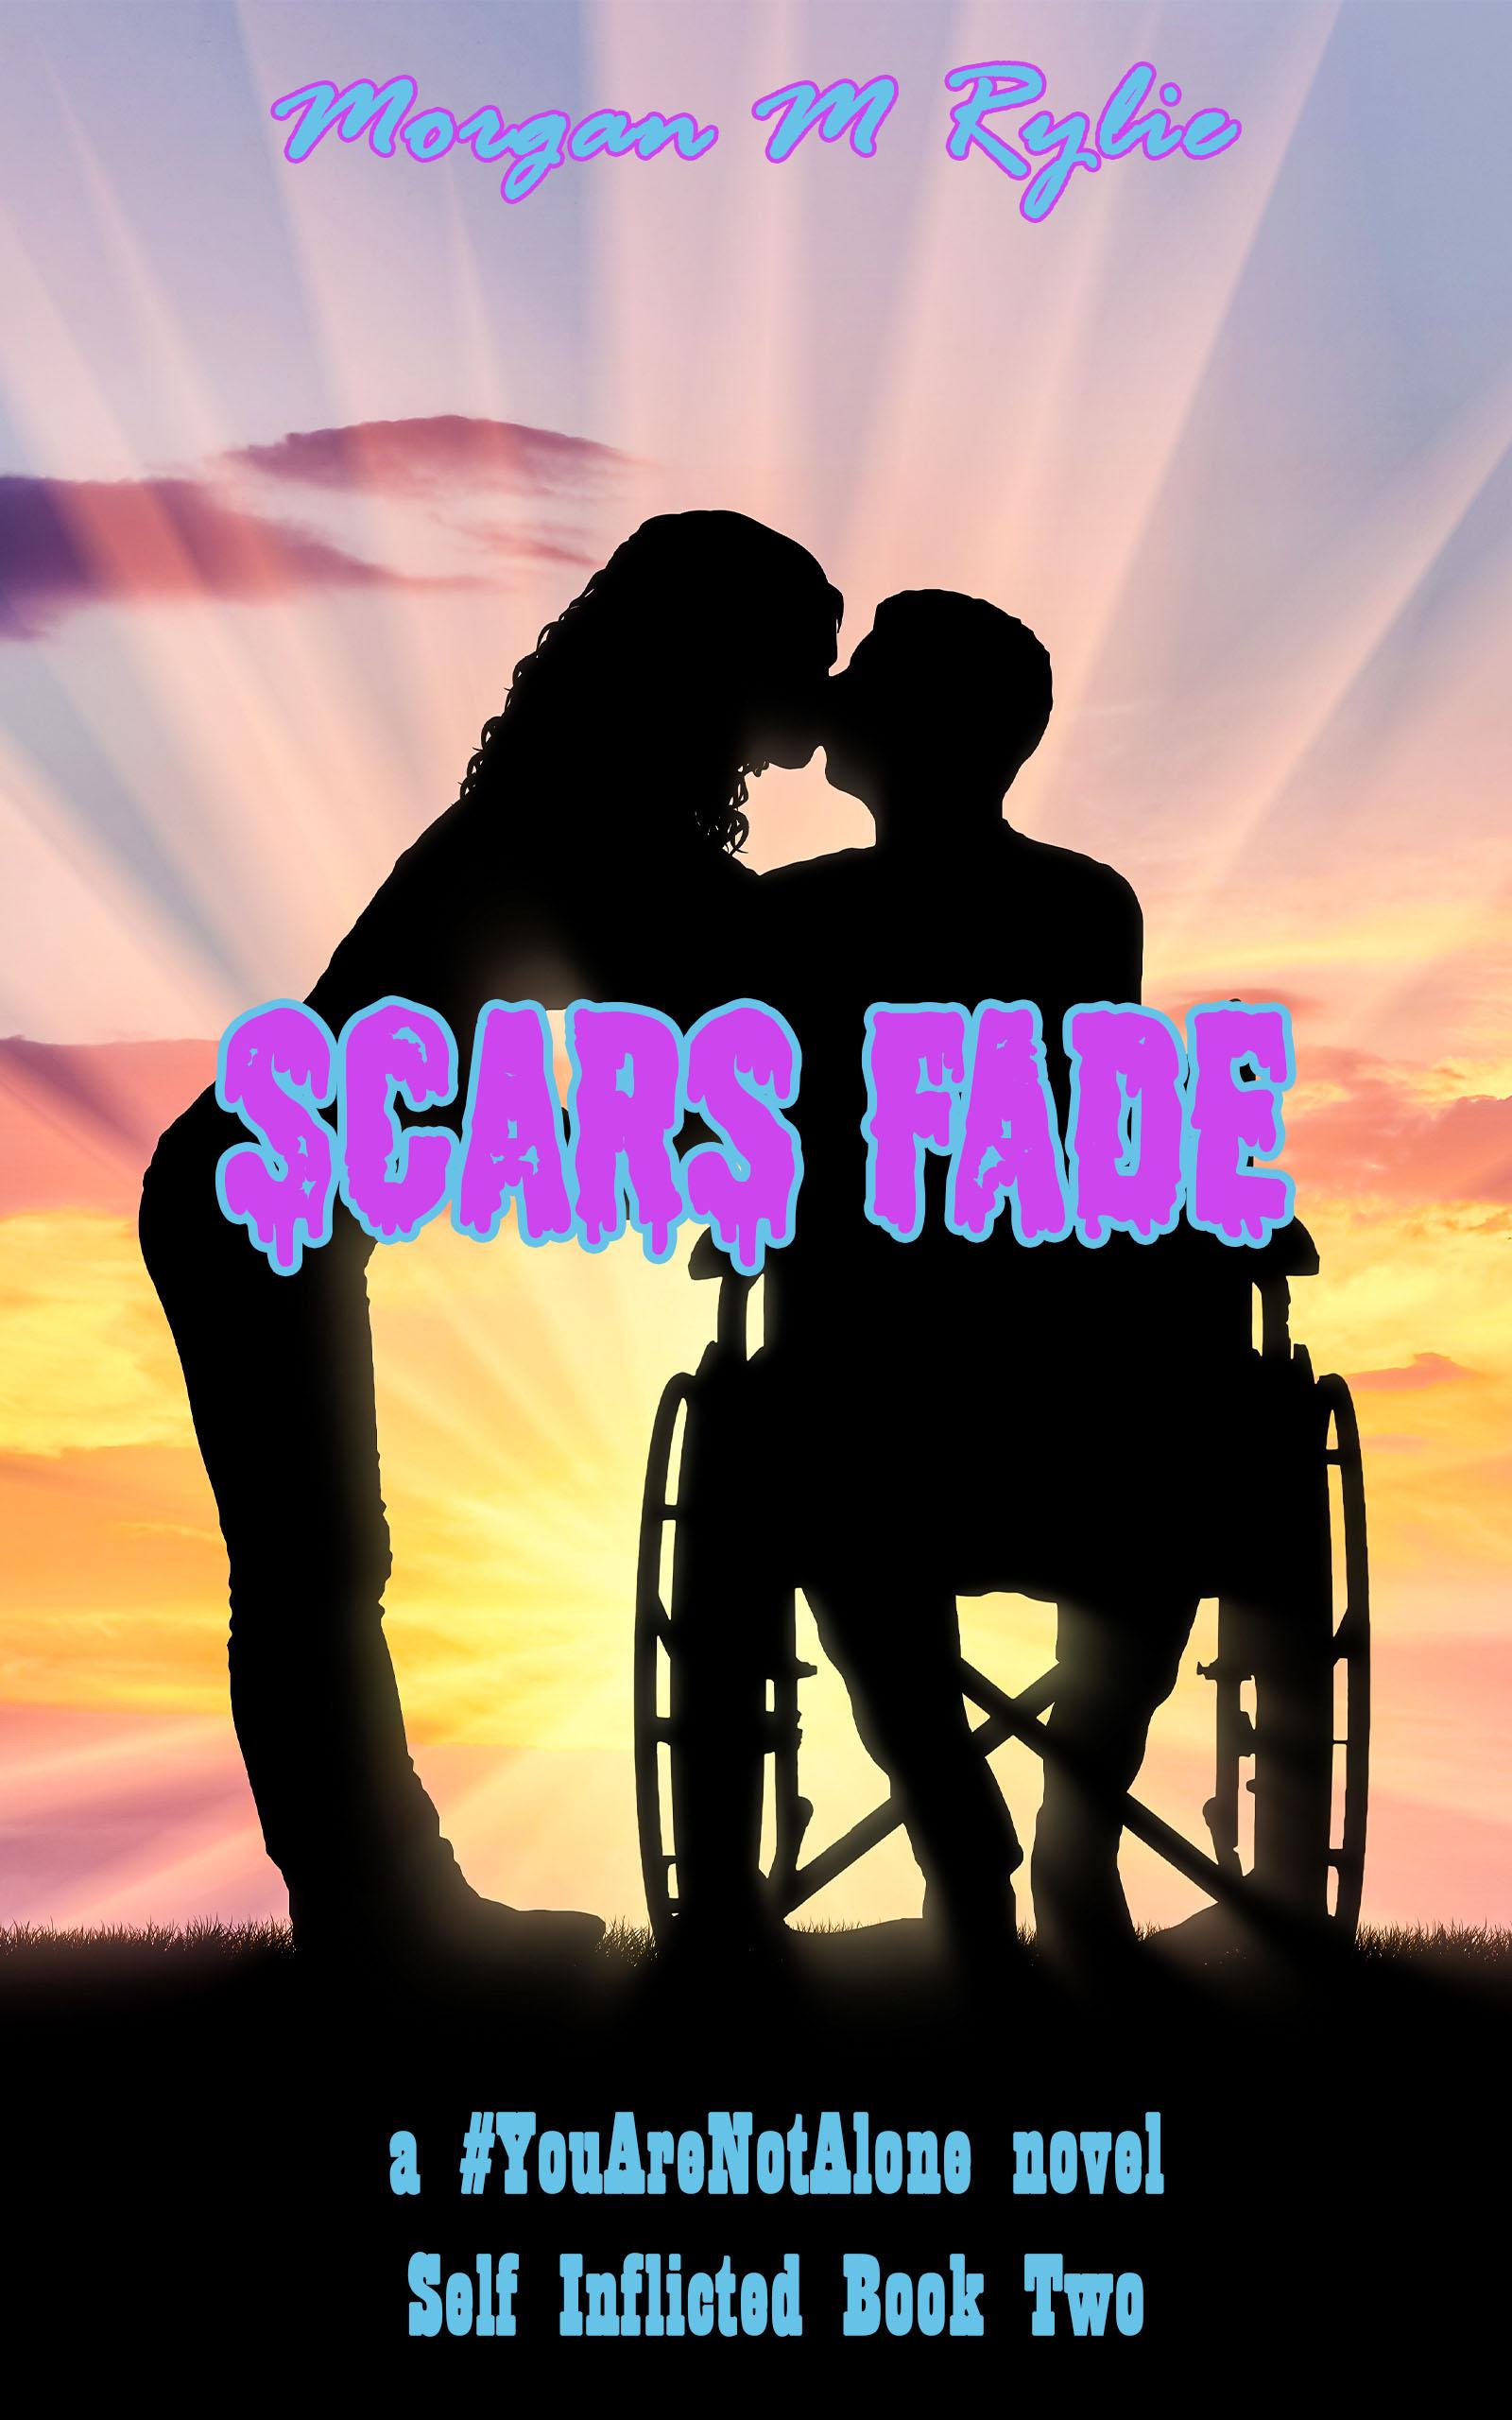 Scars Fade (#YouAreNotAlone #3)